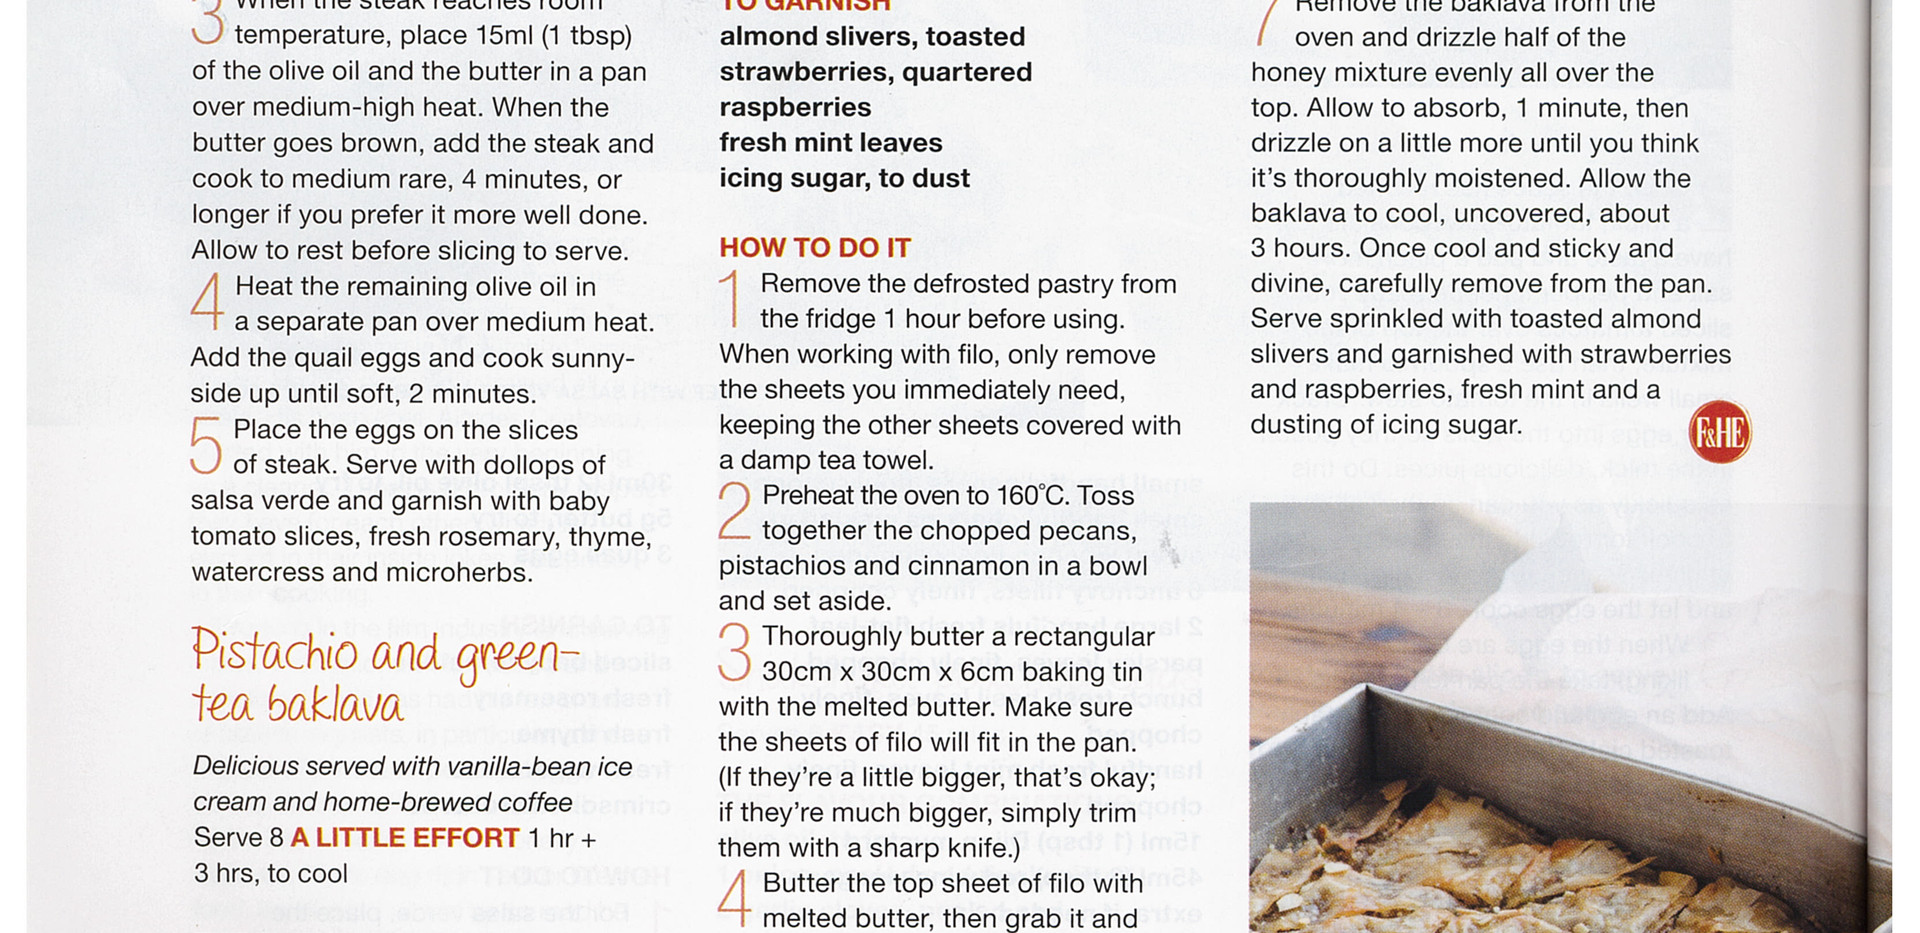 FOOD & HOME APRIL PAGE 118.jpg